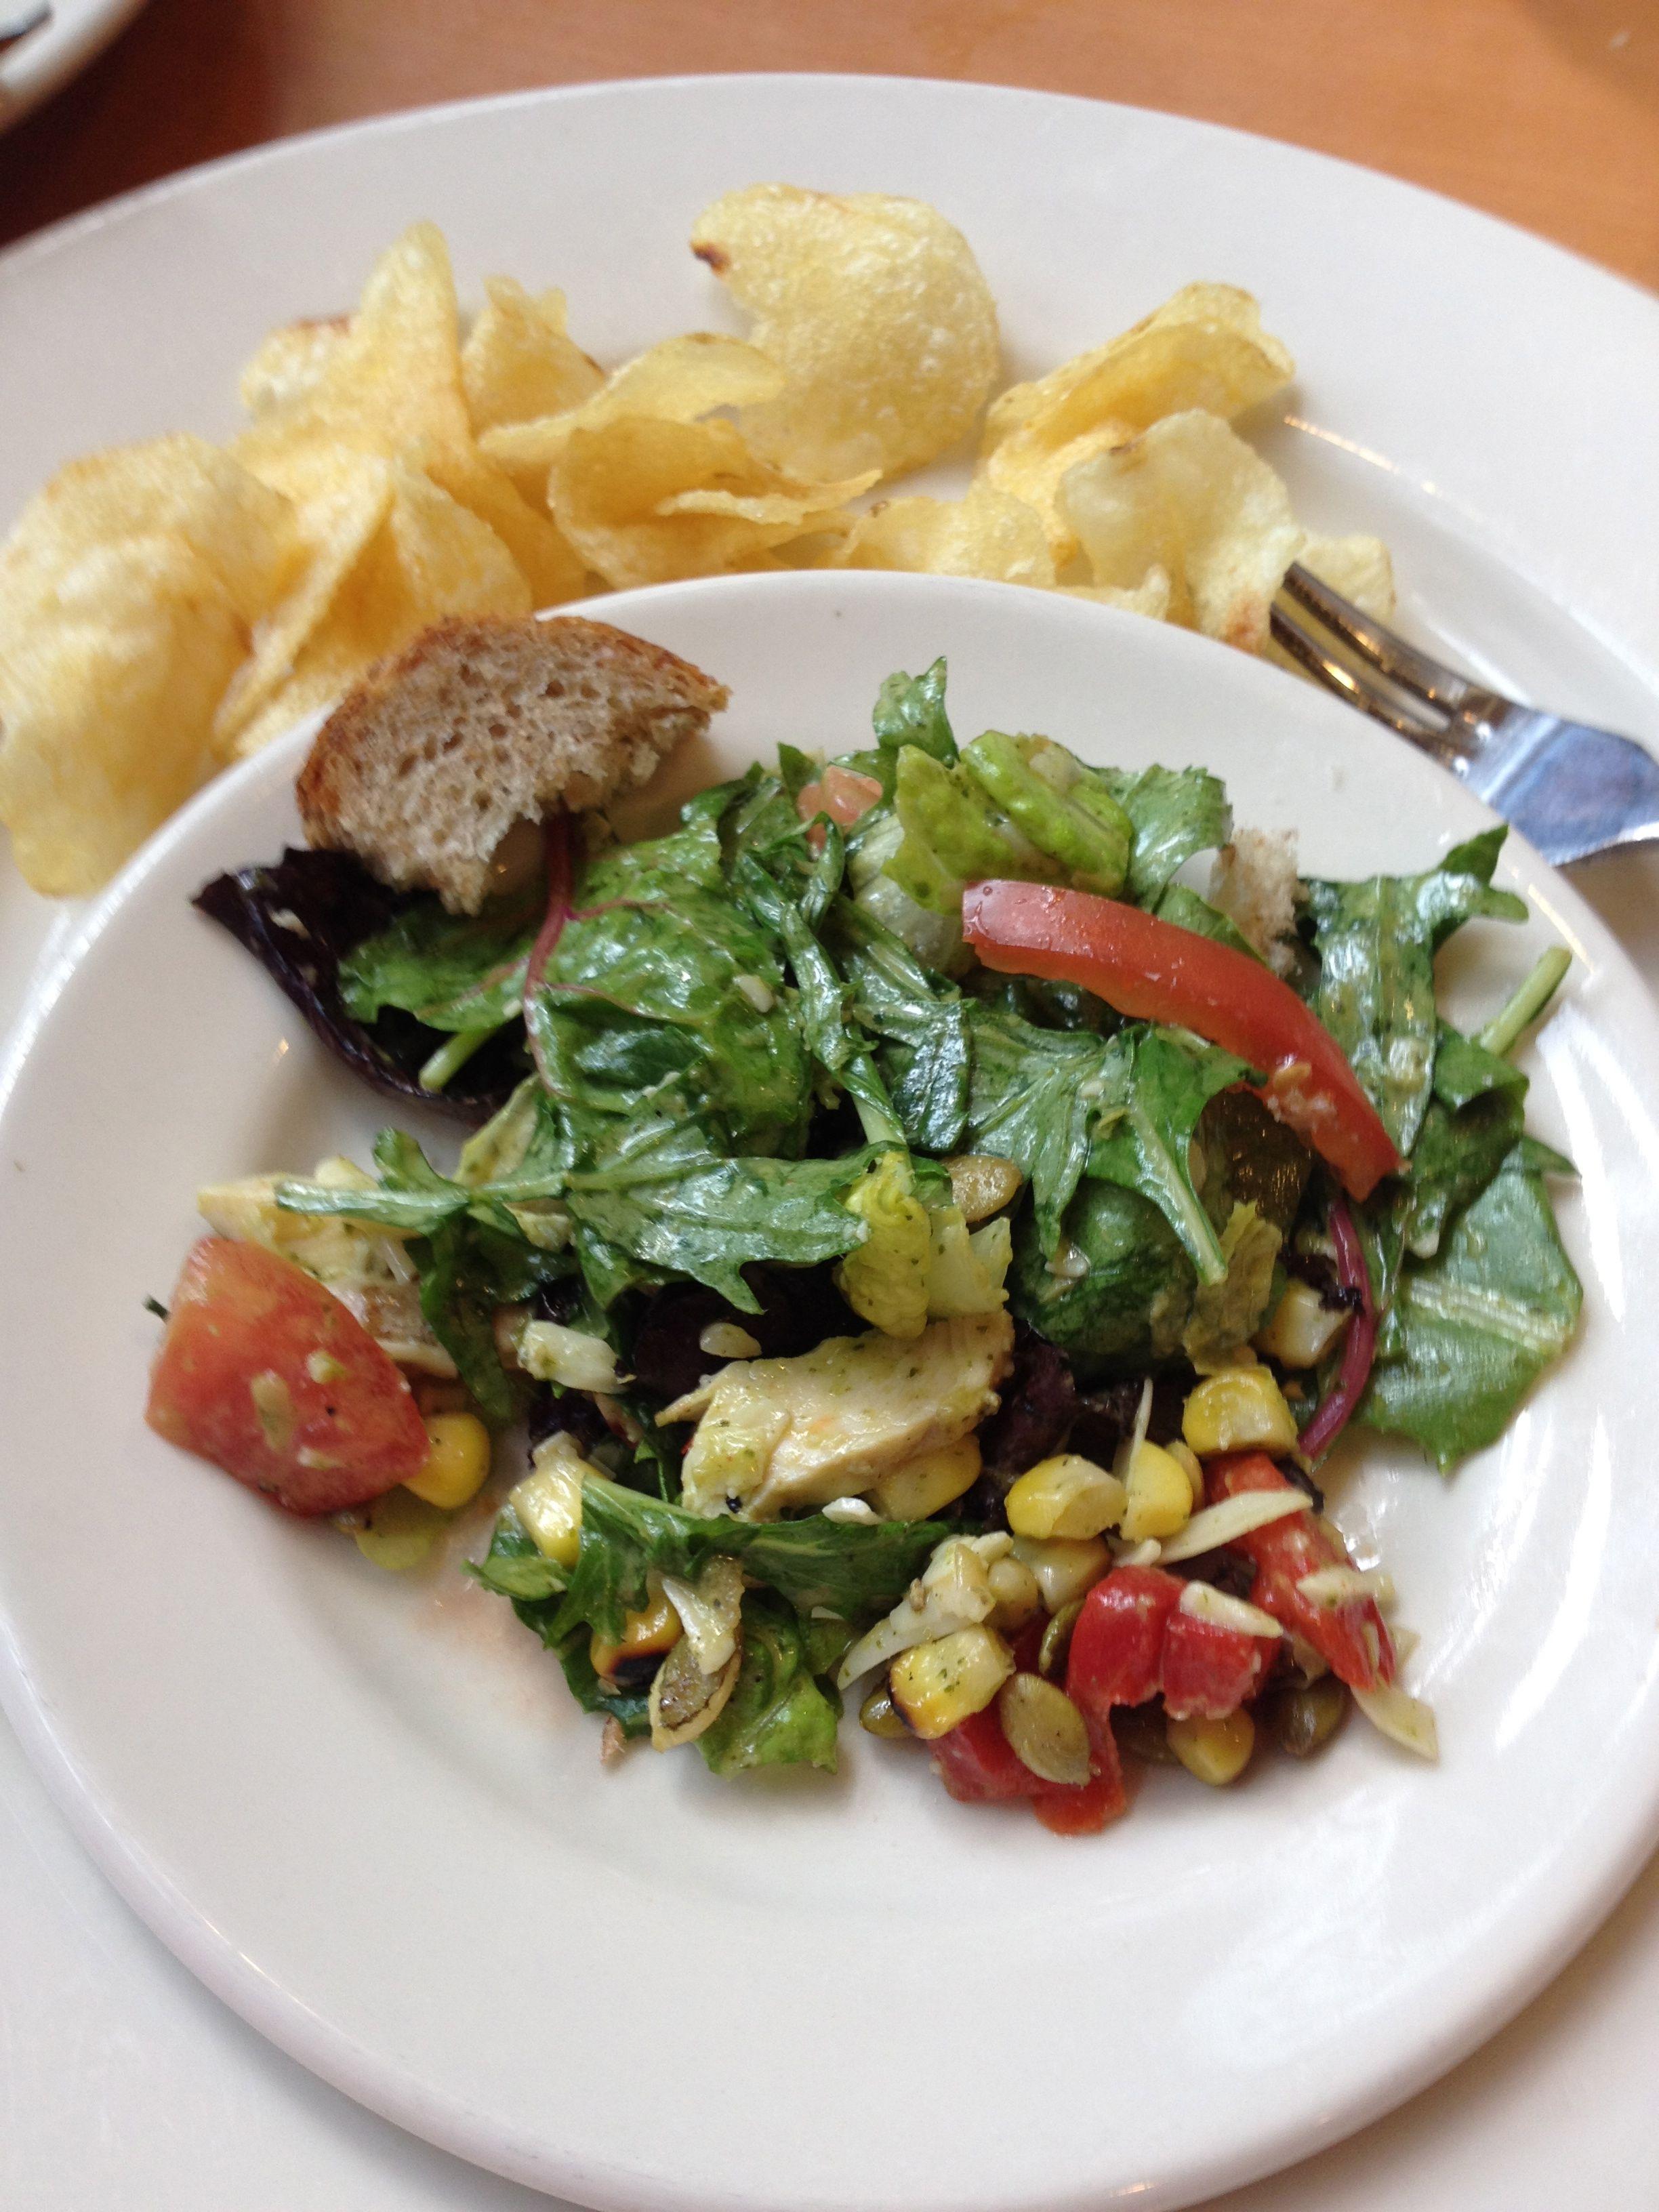 lime cilantro chicken salad. | Food & Drink | Pinterest